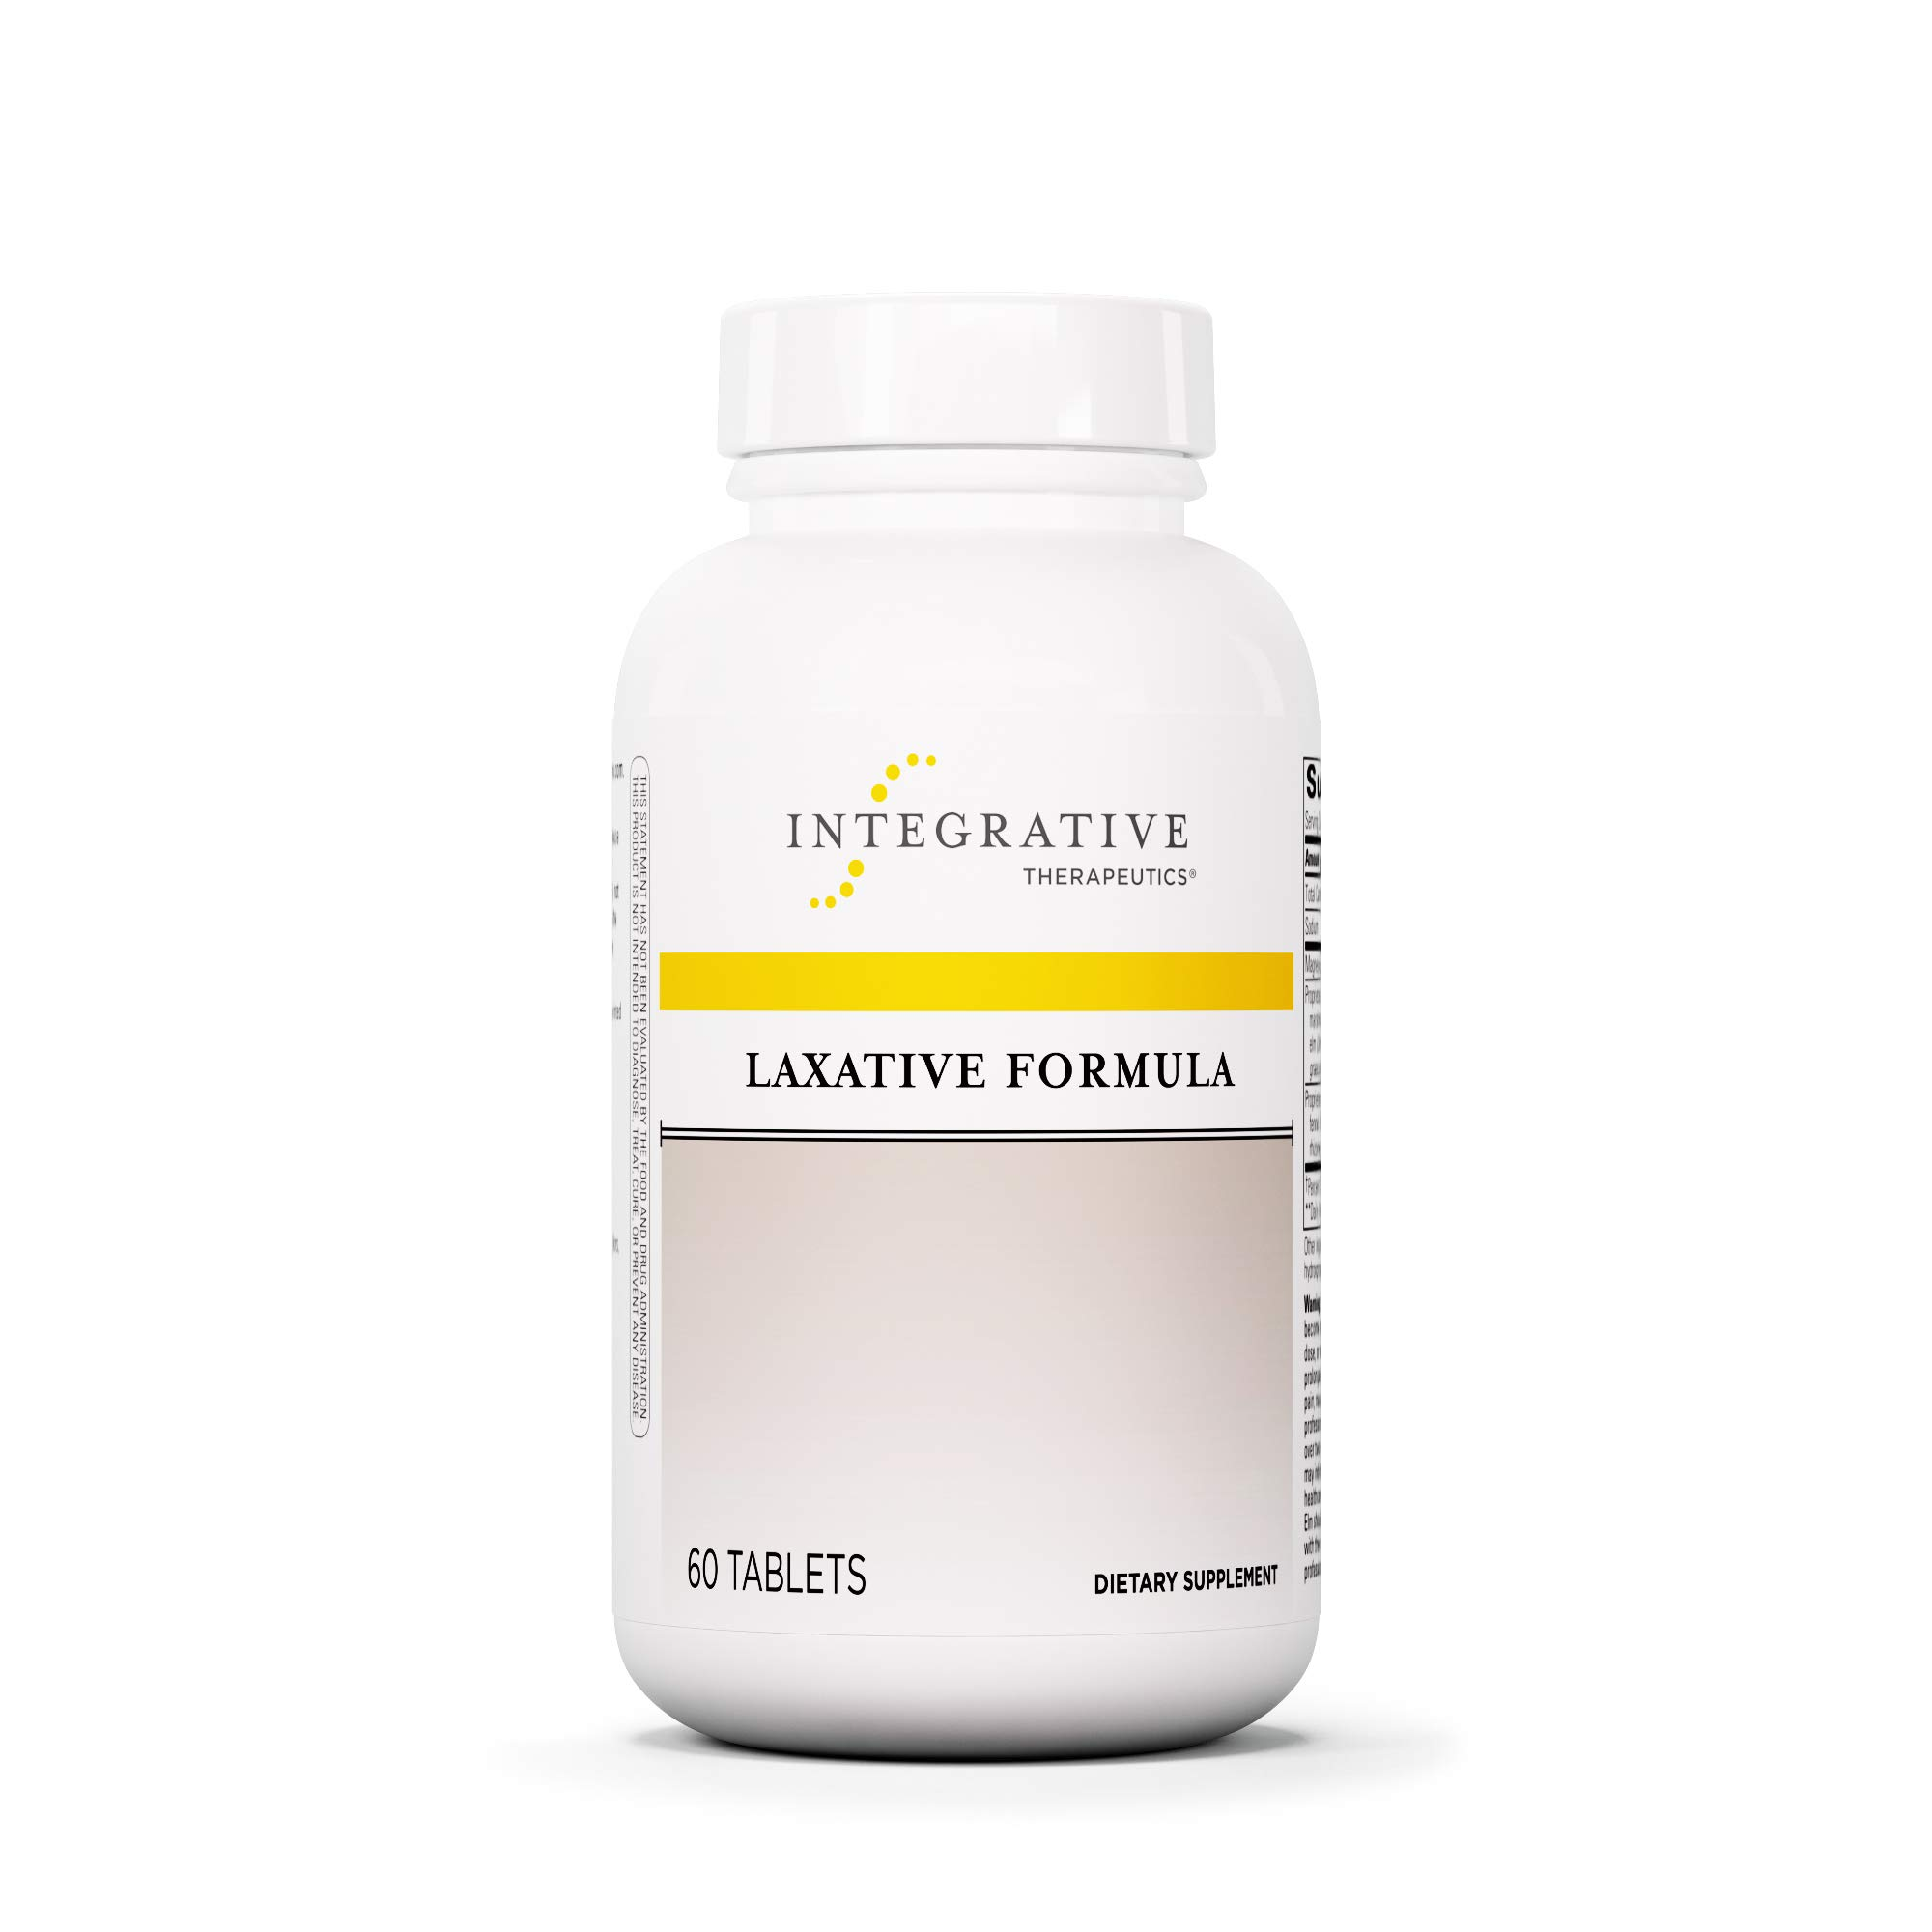 Integrative Therapeutics - Laxative Formula - Promotes Bowel Function Without Stimulant Laxatives - 60 Tablets